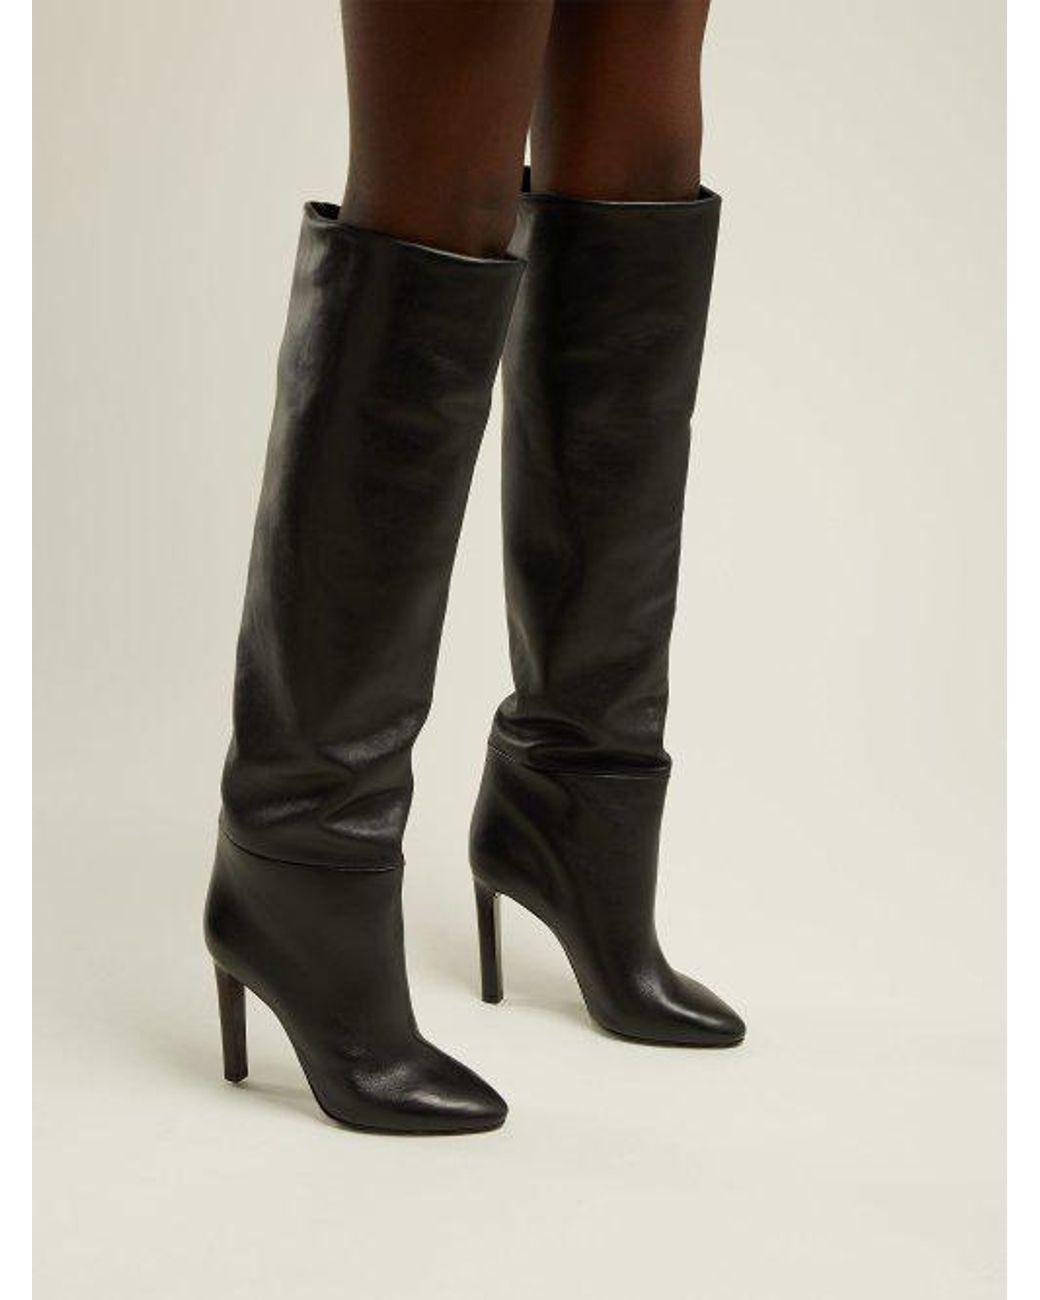 e329db97b43 Saint Laurent - Black Kate Knee High Leather Boots - Lyst